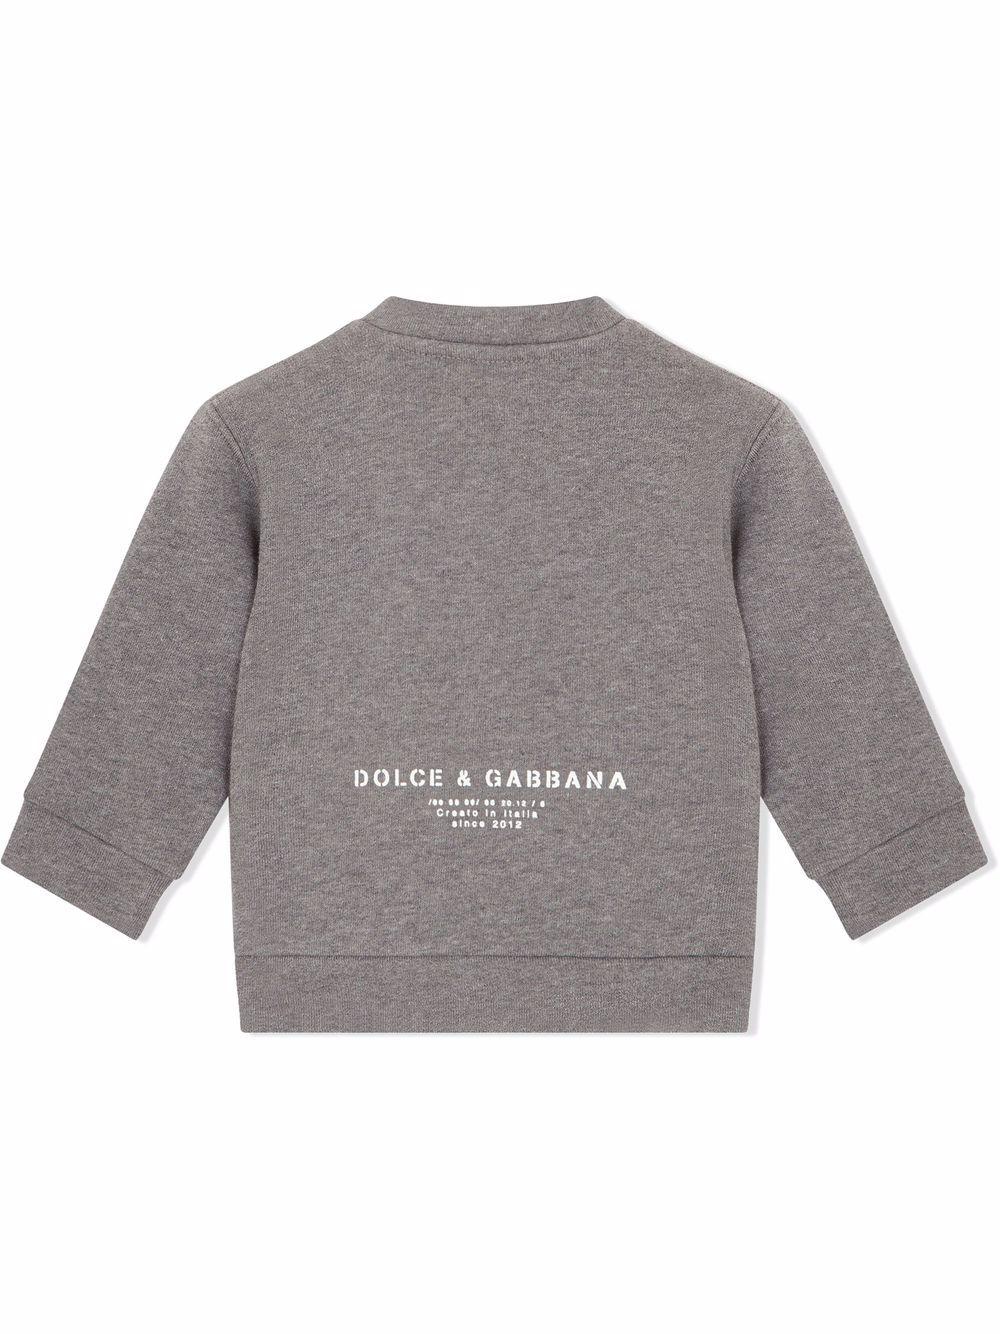 Sweatshirt Dolce & Gabbana kids  DOLCE&GABBANA KIDS | -108764232 | L1JWBFG7A8IHI3AQ